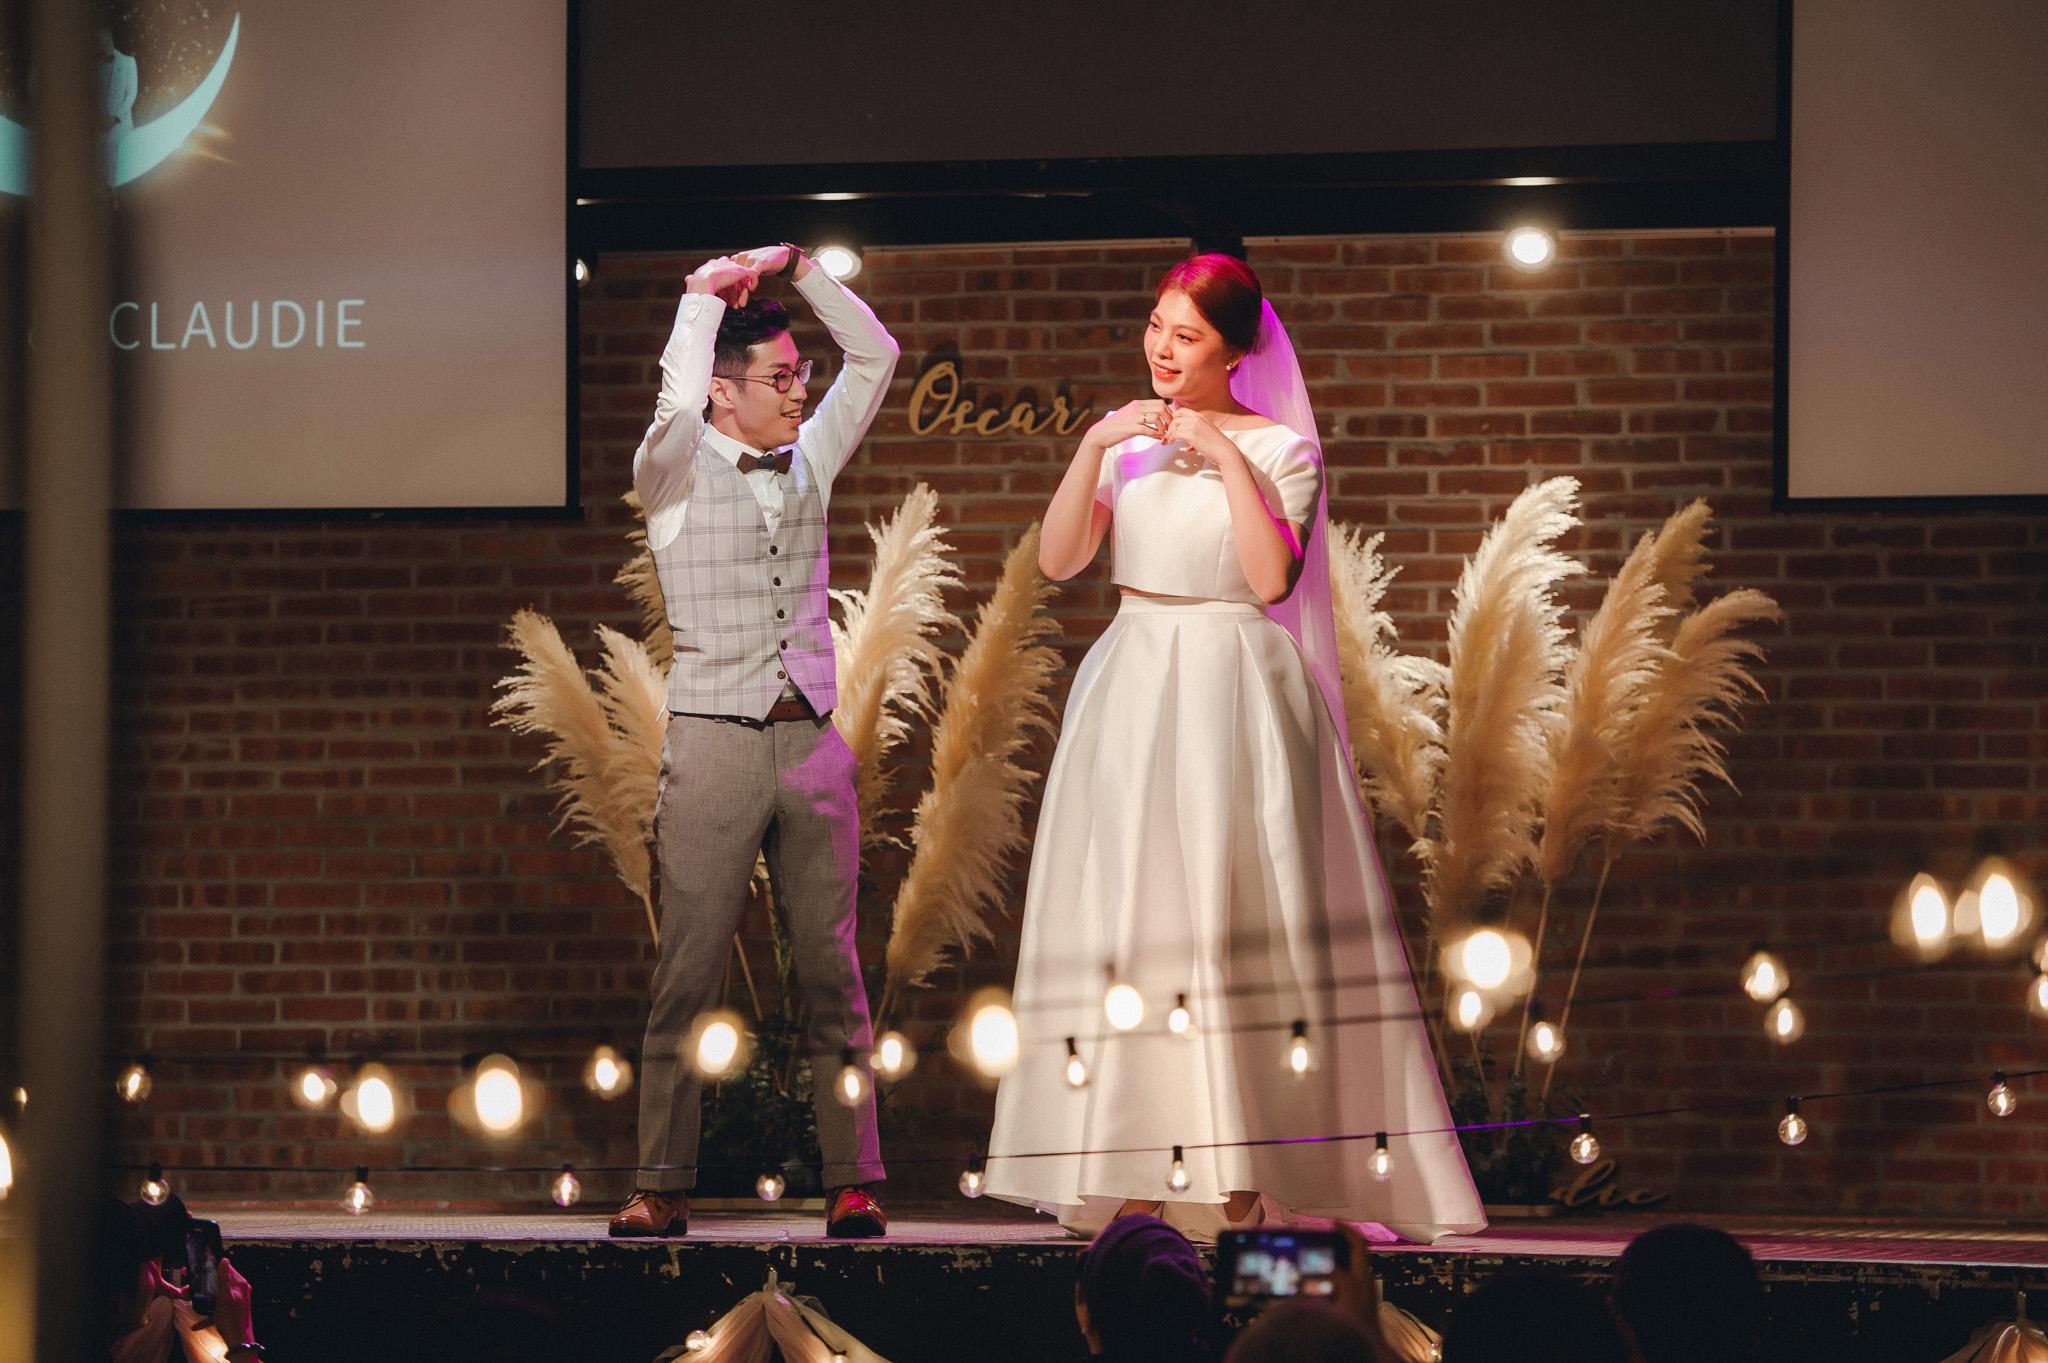 EW 台北婚攝 居米 濟南教會 Brick Yard 33 美軍俱樂部 婚禮 婚宴-71